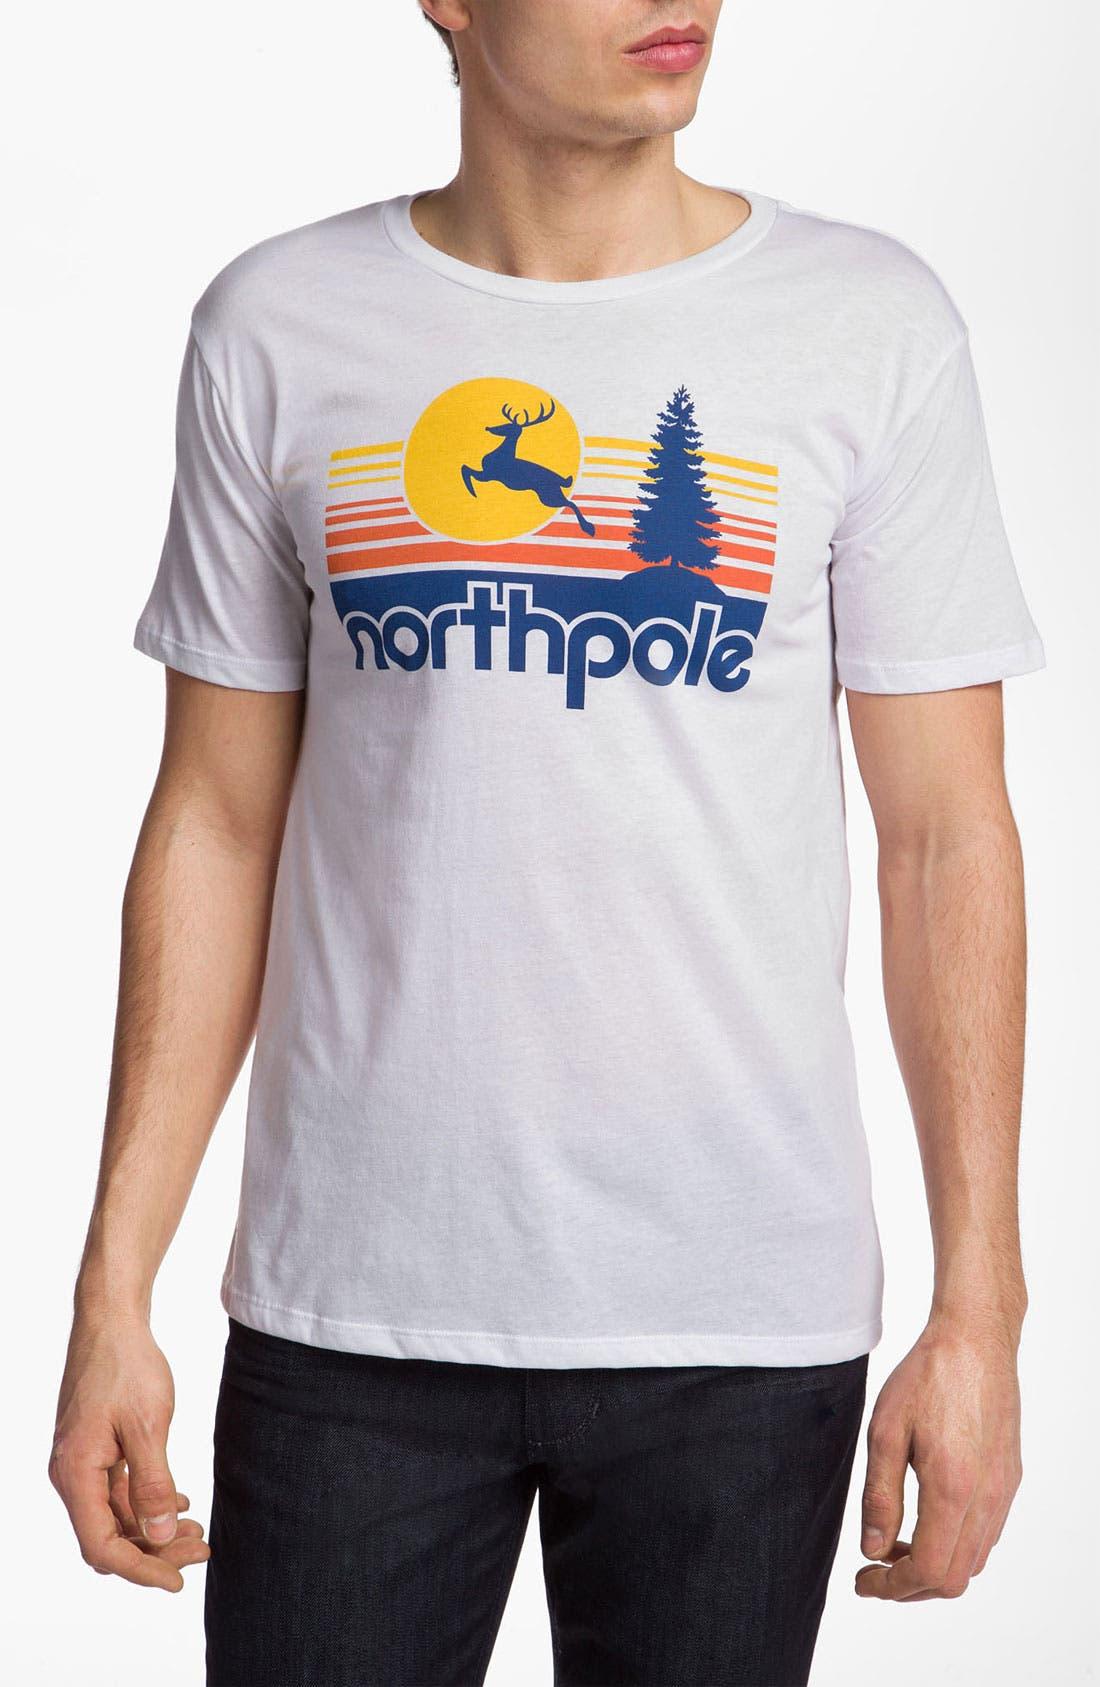 Alternate Image 1 Selected - Headline Shirts 'North Pole Vacation' T-Shirt